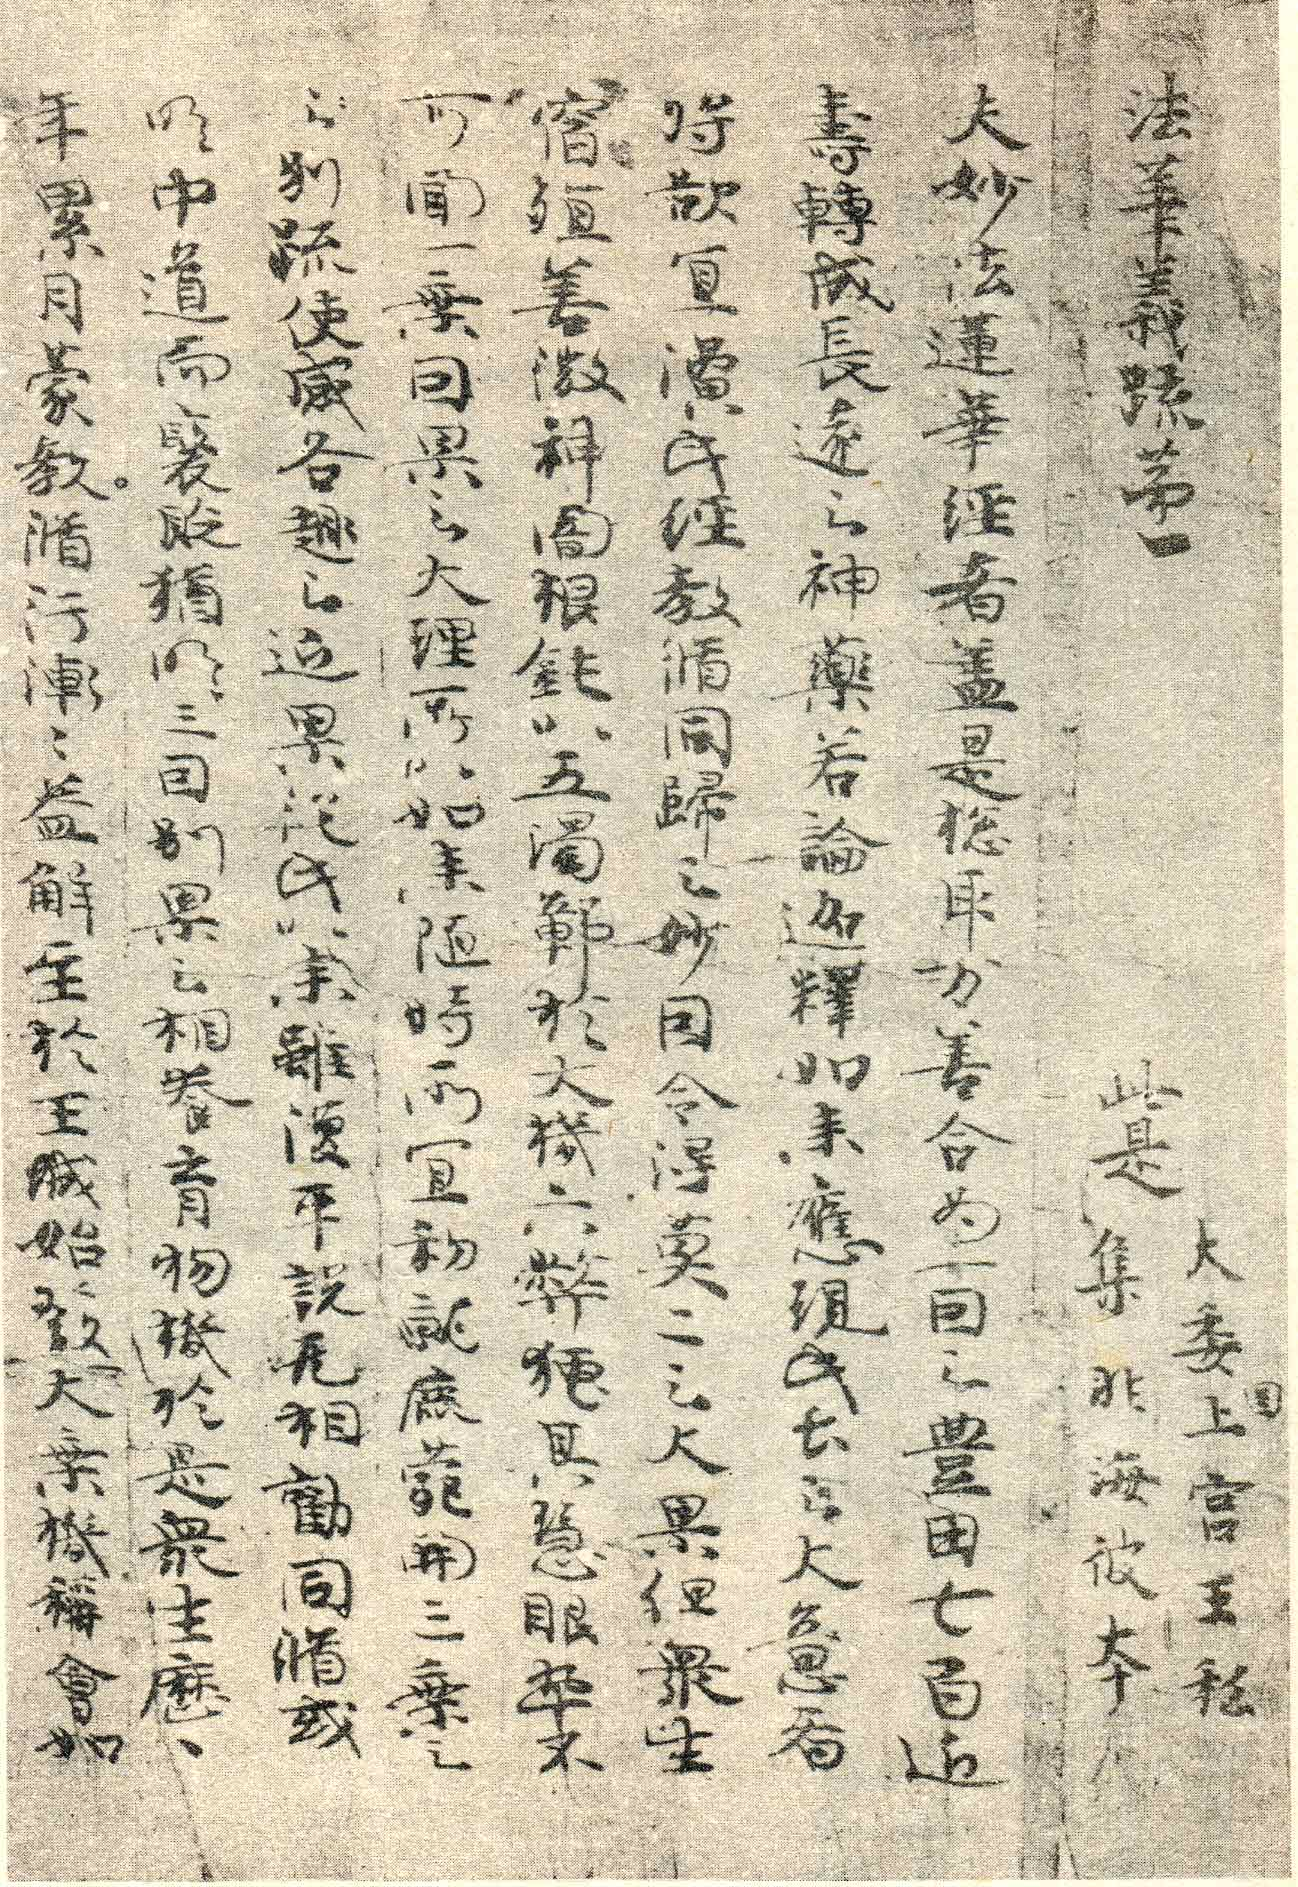 File:Lotus Sutra written by Prince Shōtoku.jpg - Wikipedia, the free ...